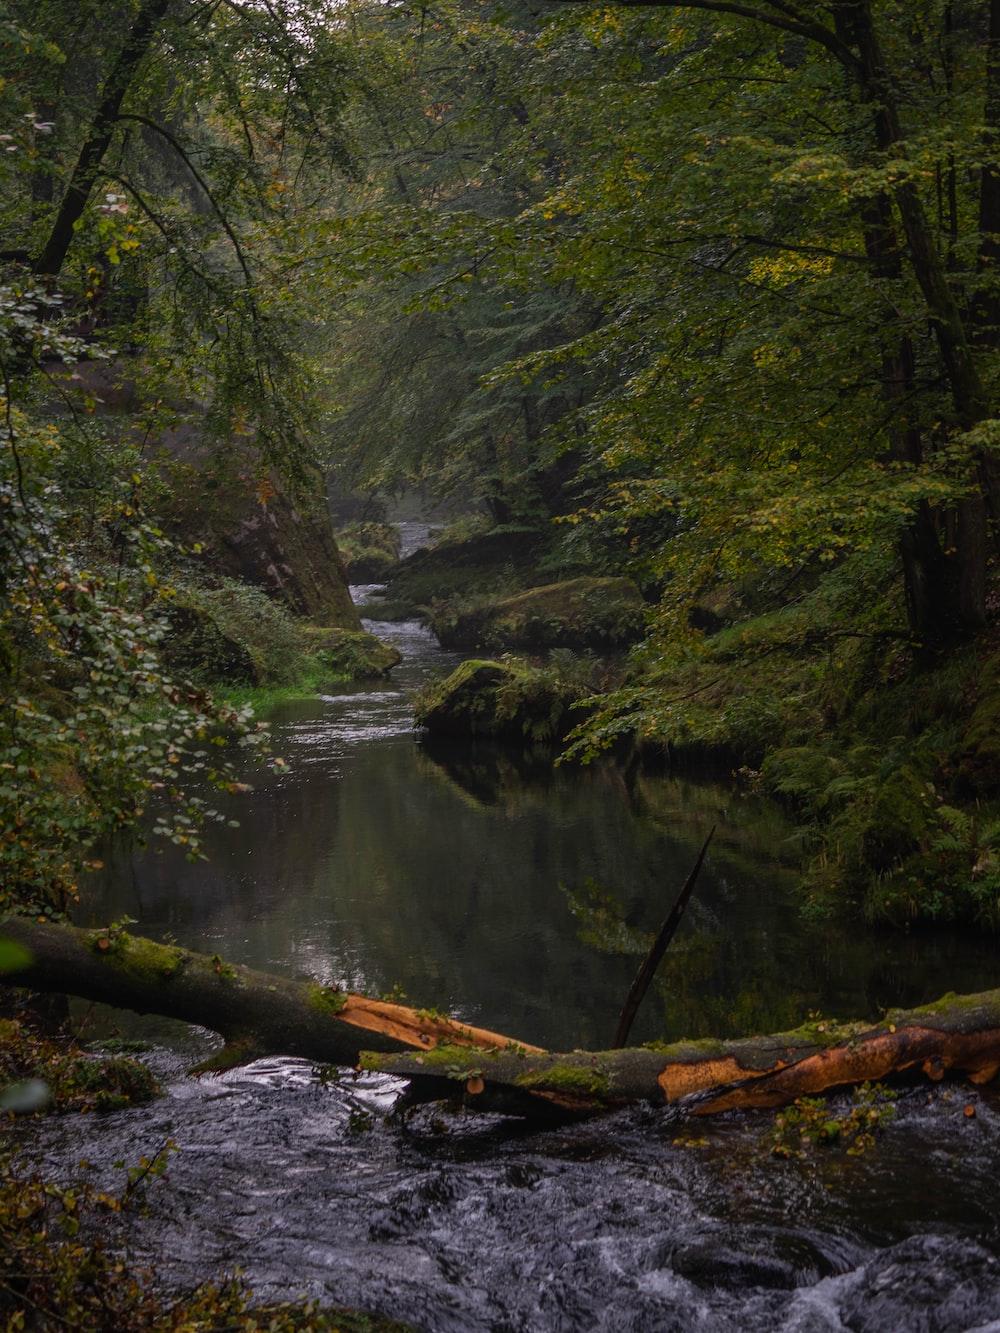 green trees beside body of water